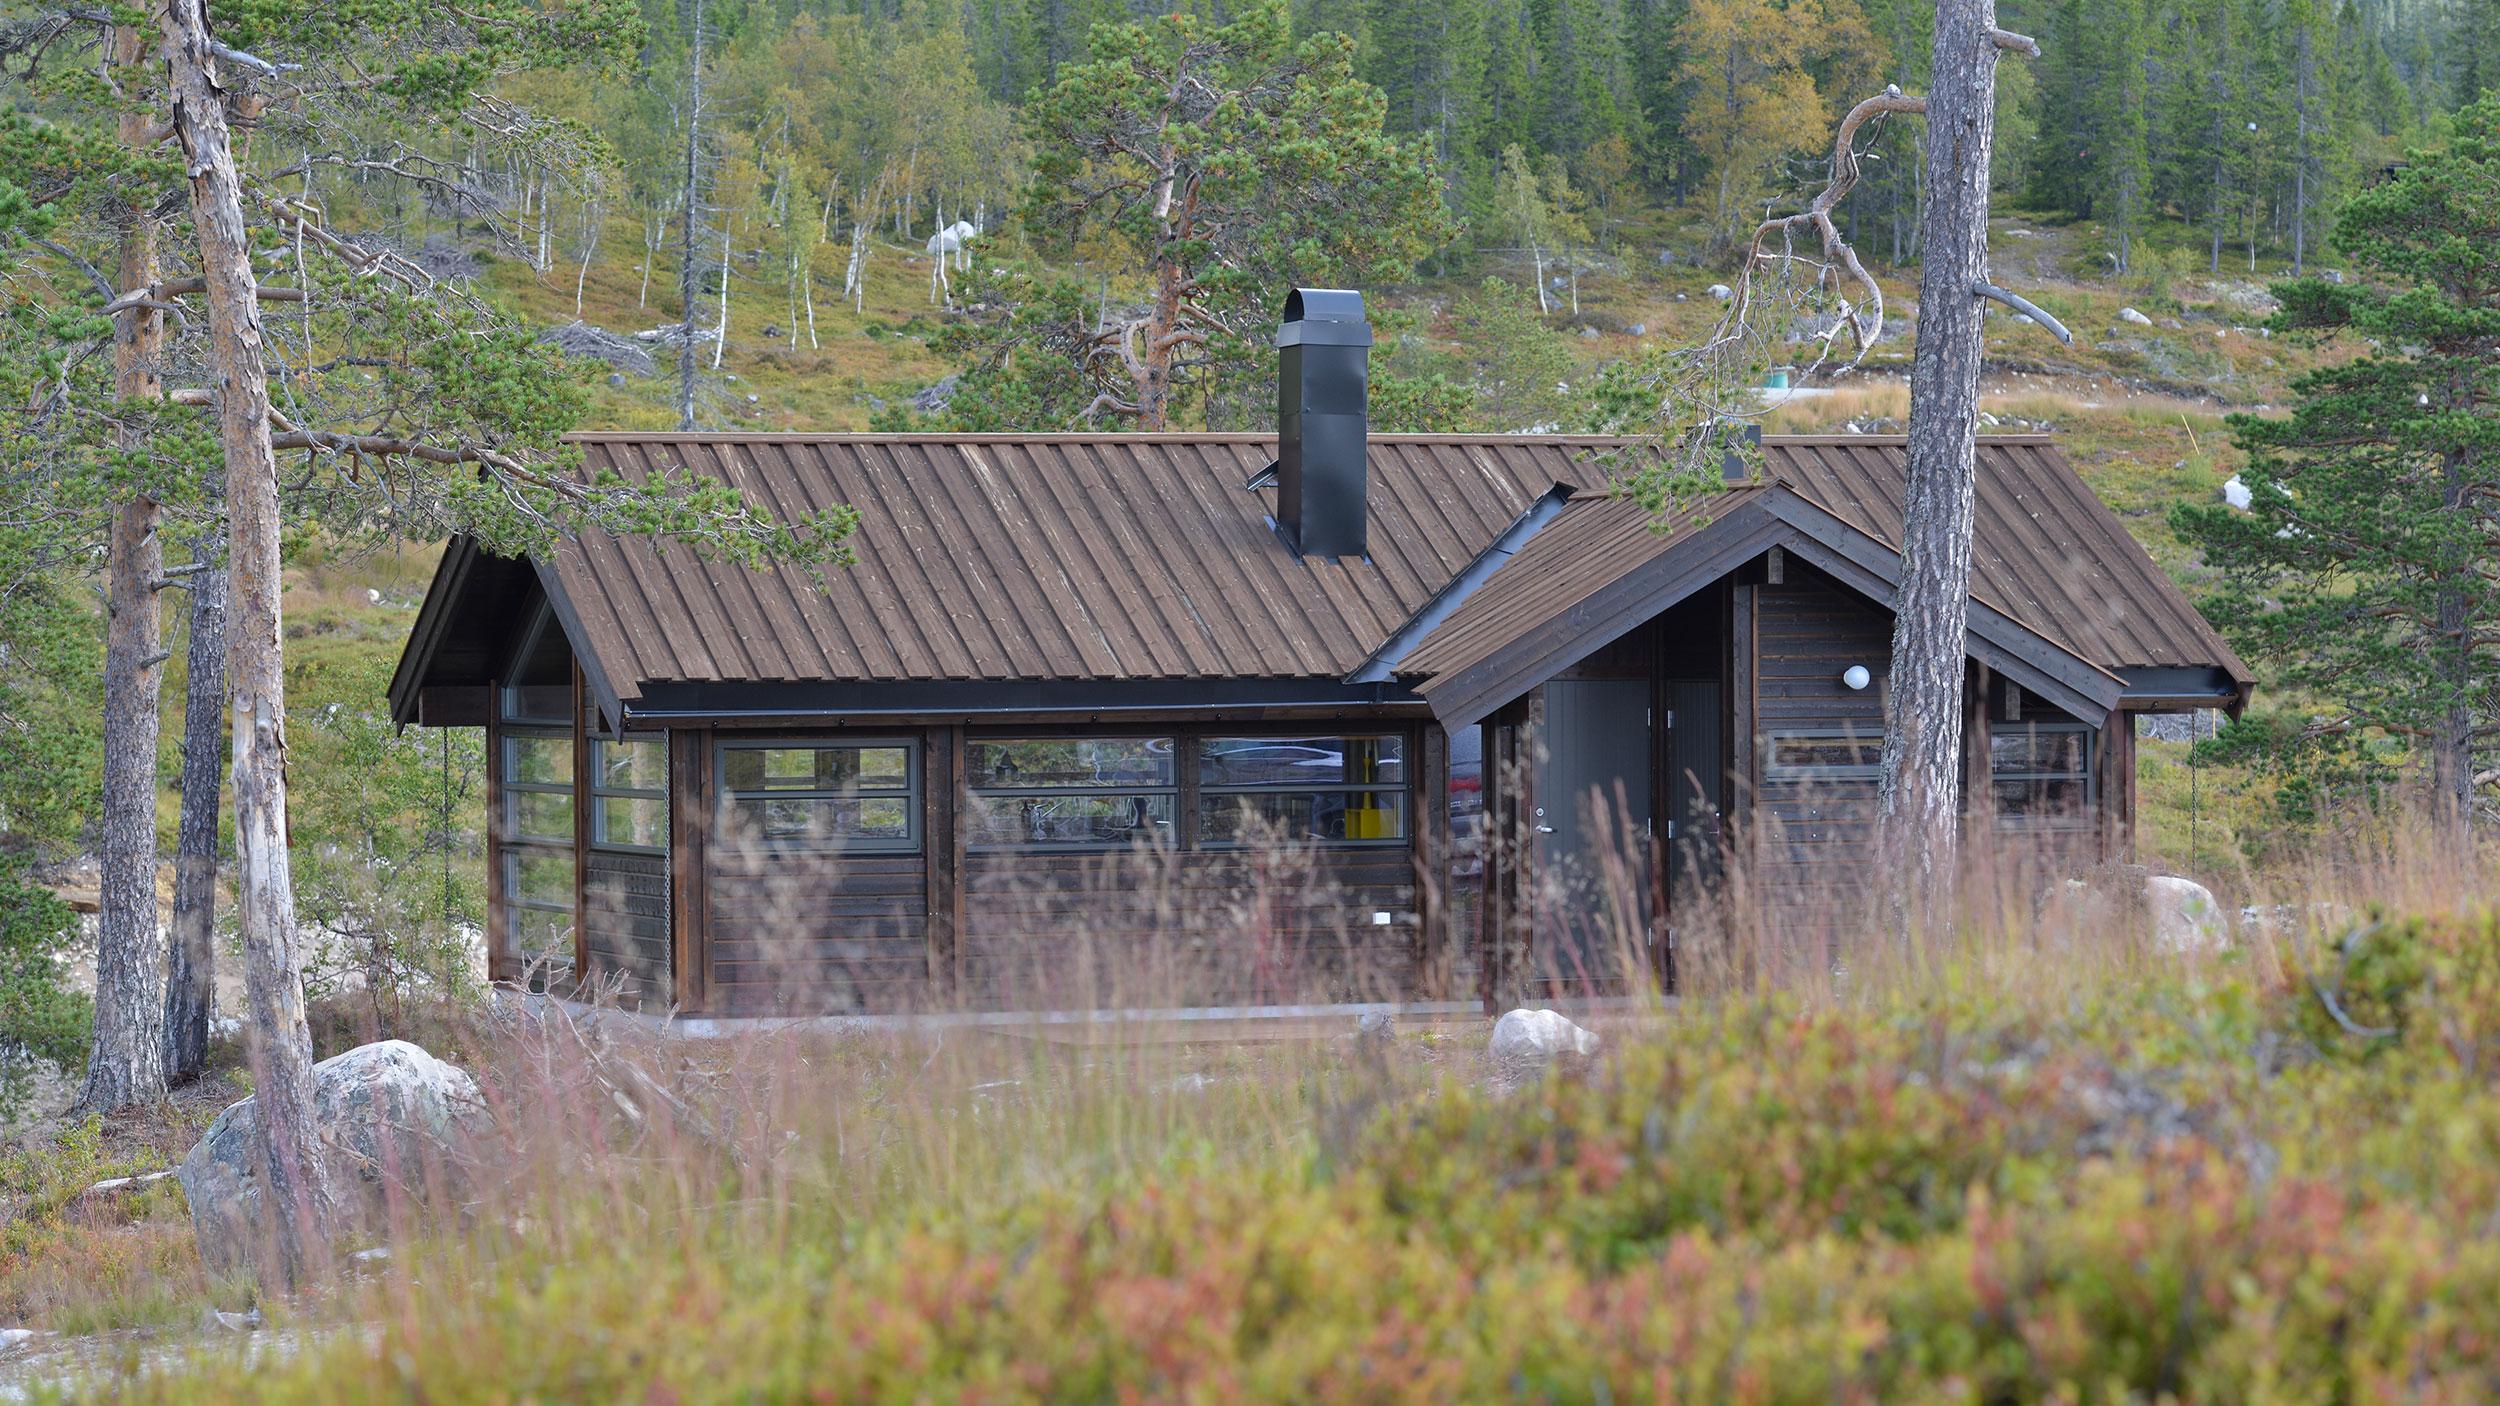 C30-provebohytte_Sorbolfjell_SVA2162.jpg